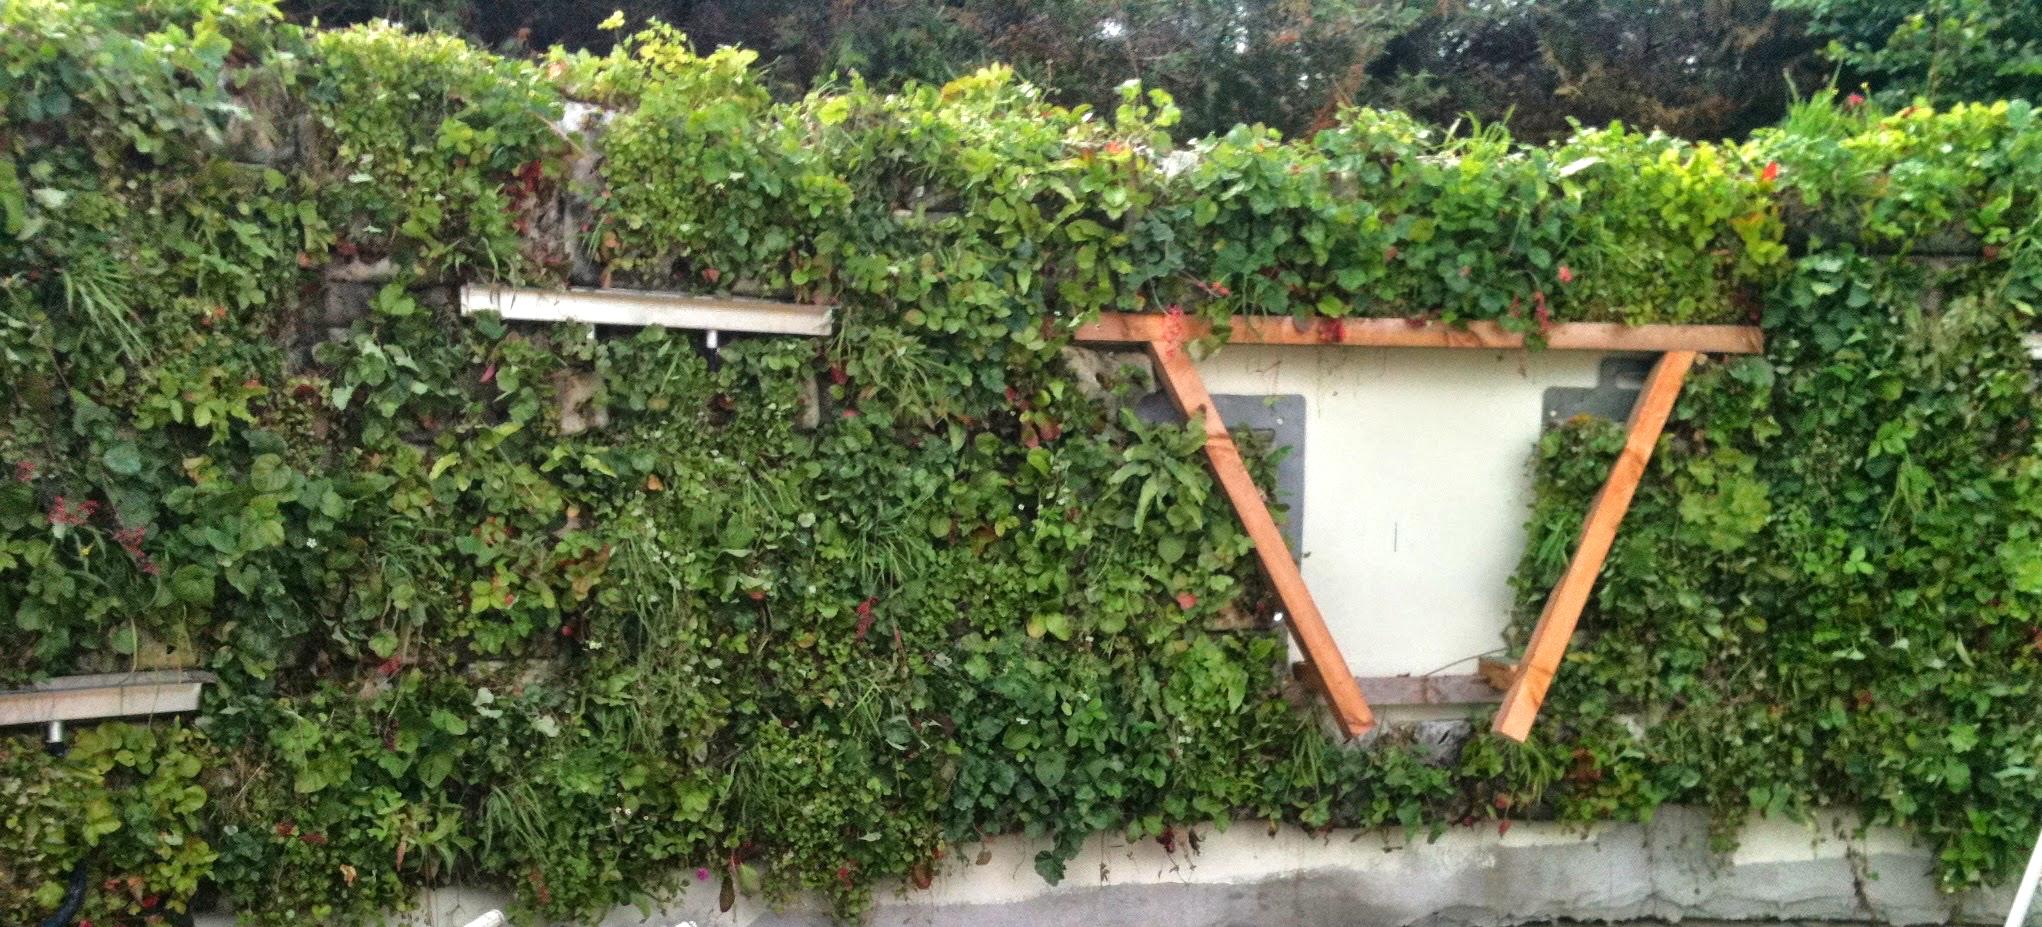 Curved Living wall Design.jpg